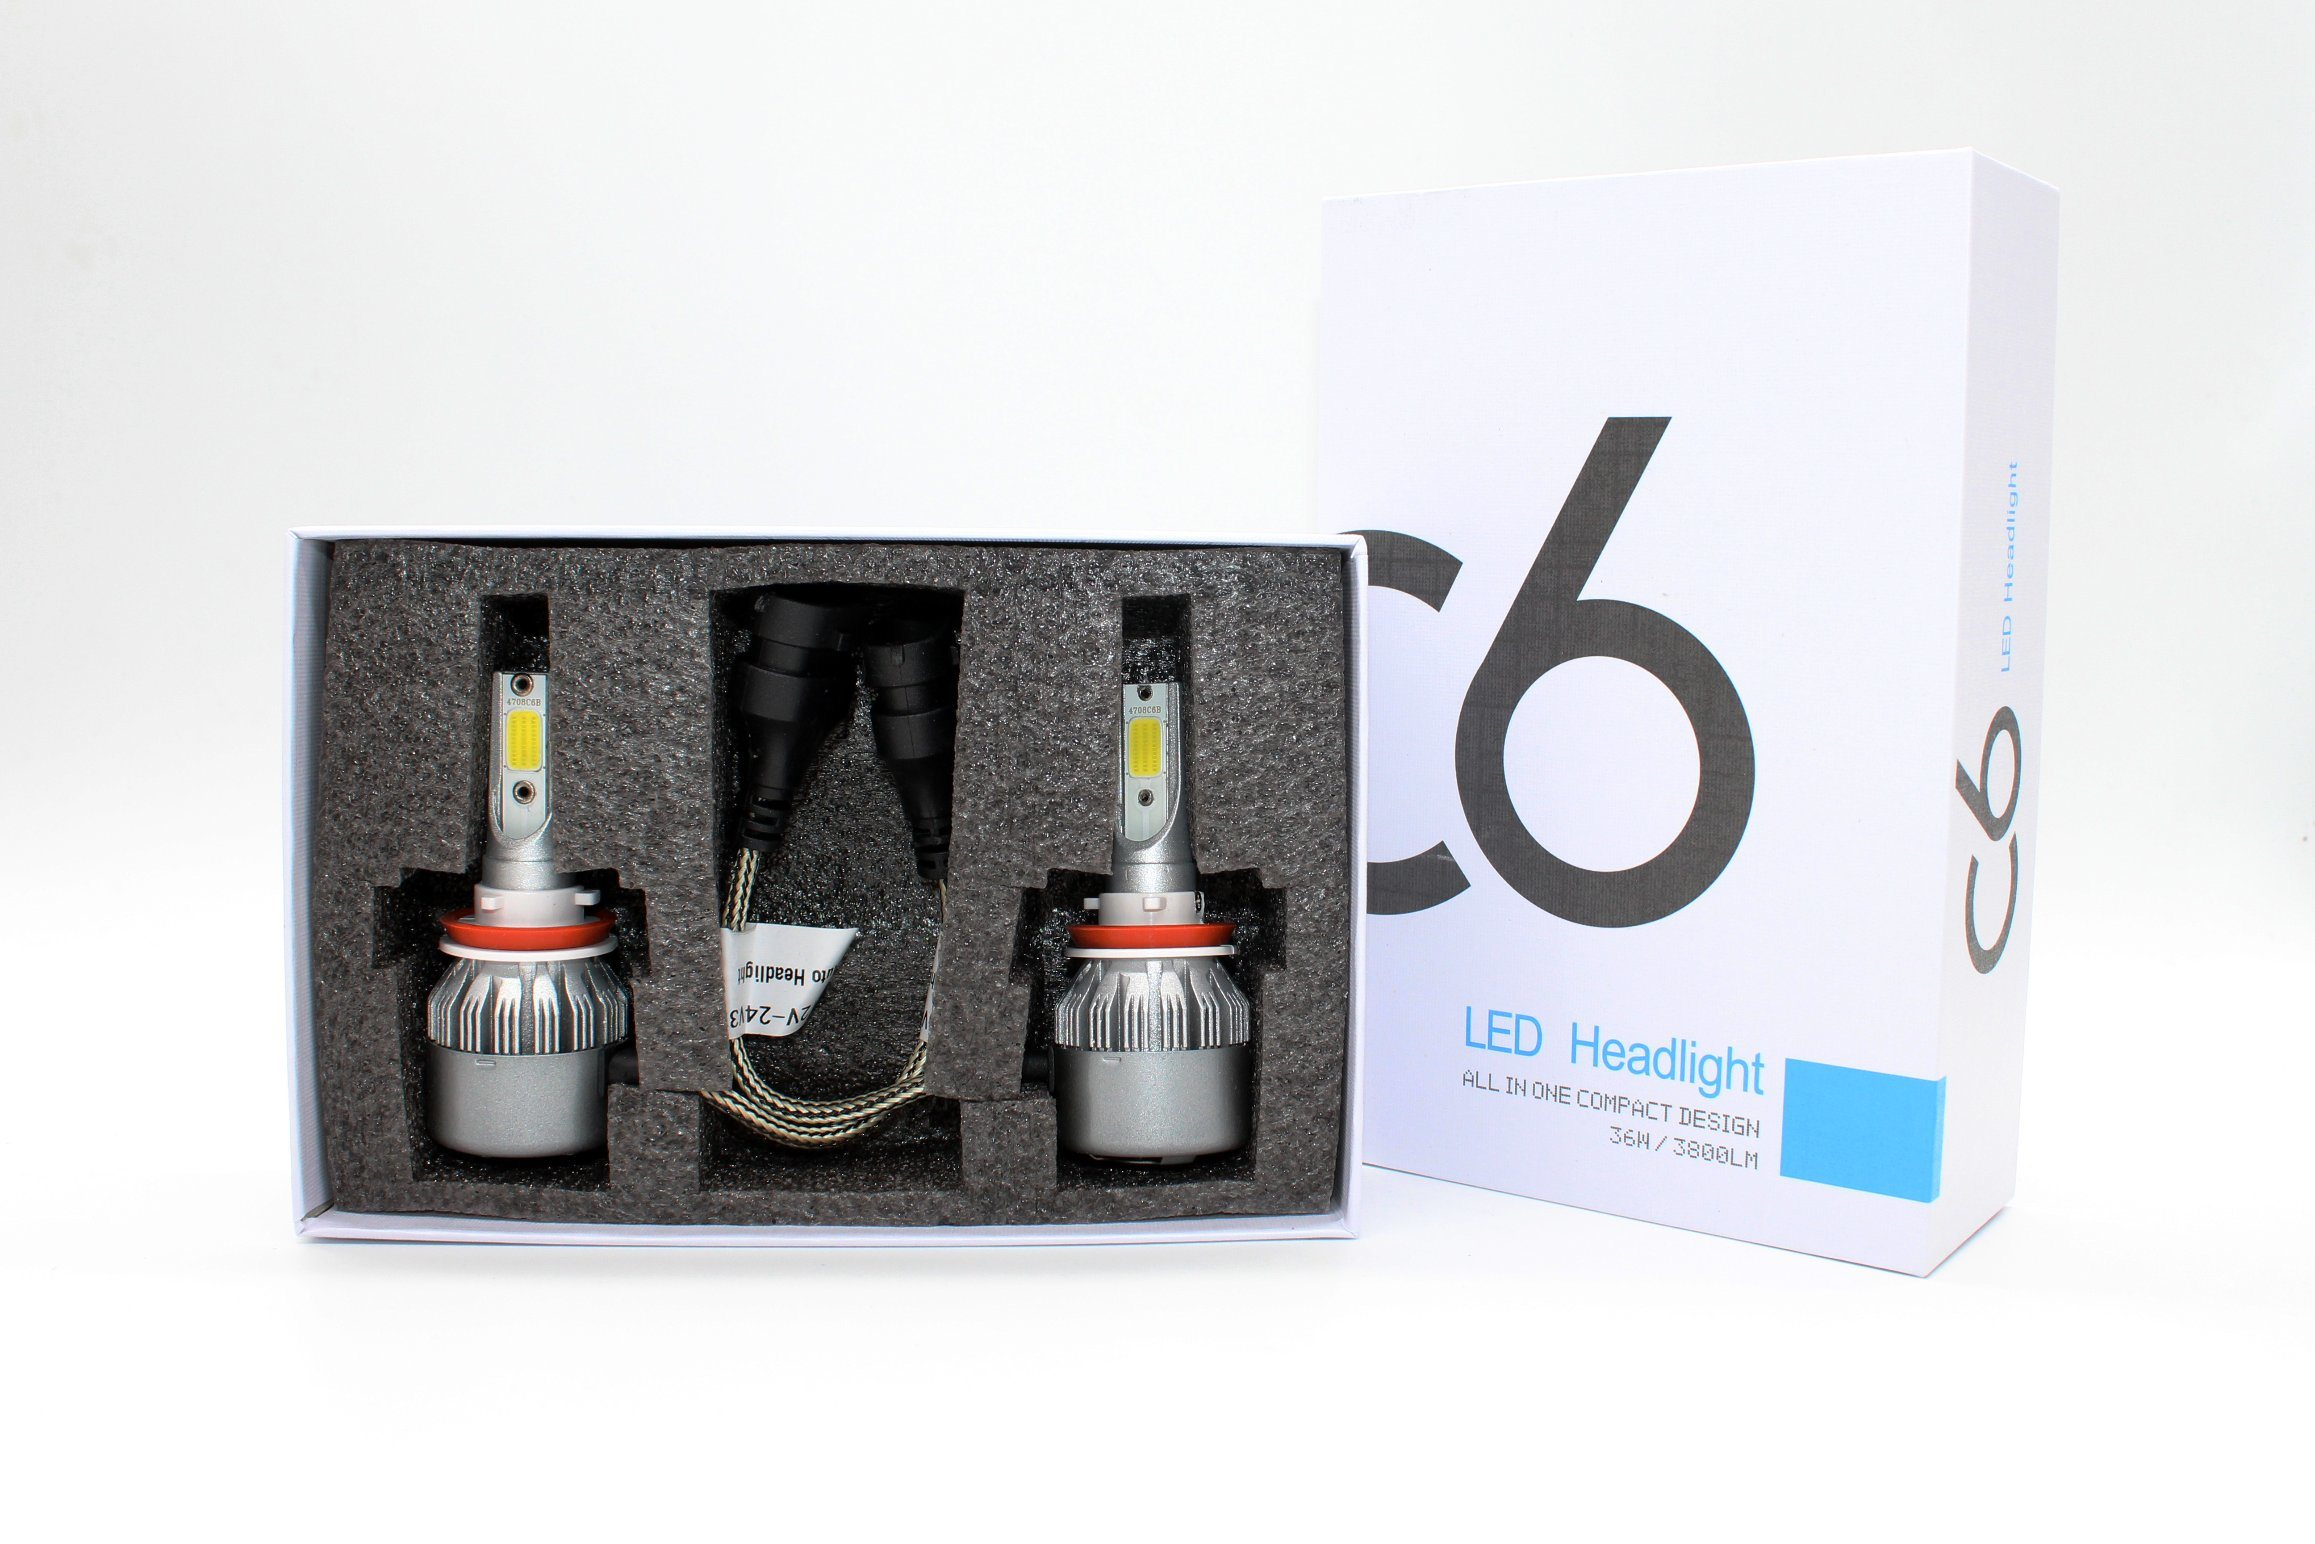 2017 Hot Selling H13 Generation Headlight 12V 40W Auto LED Headlight